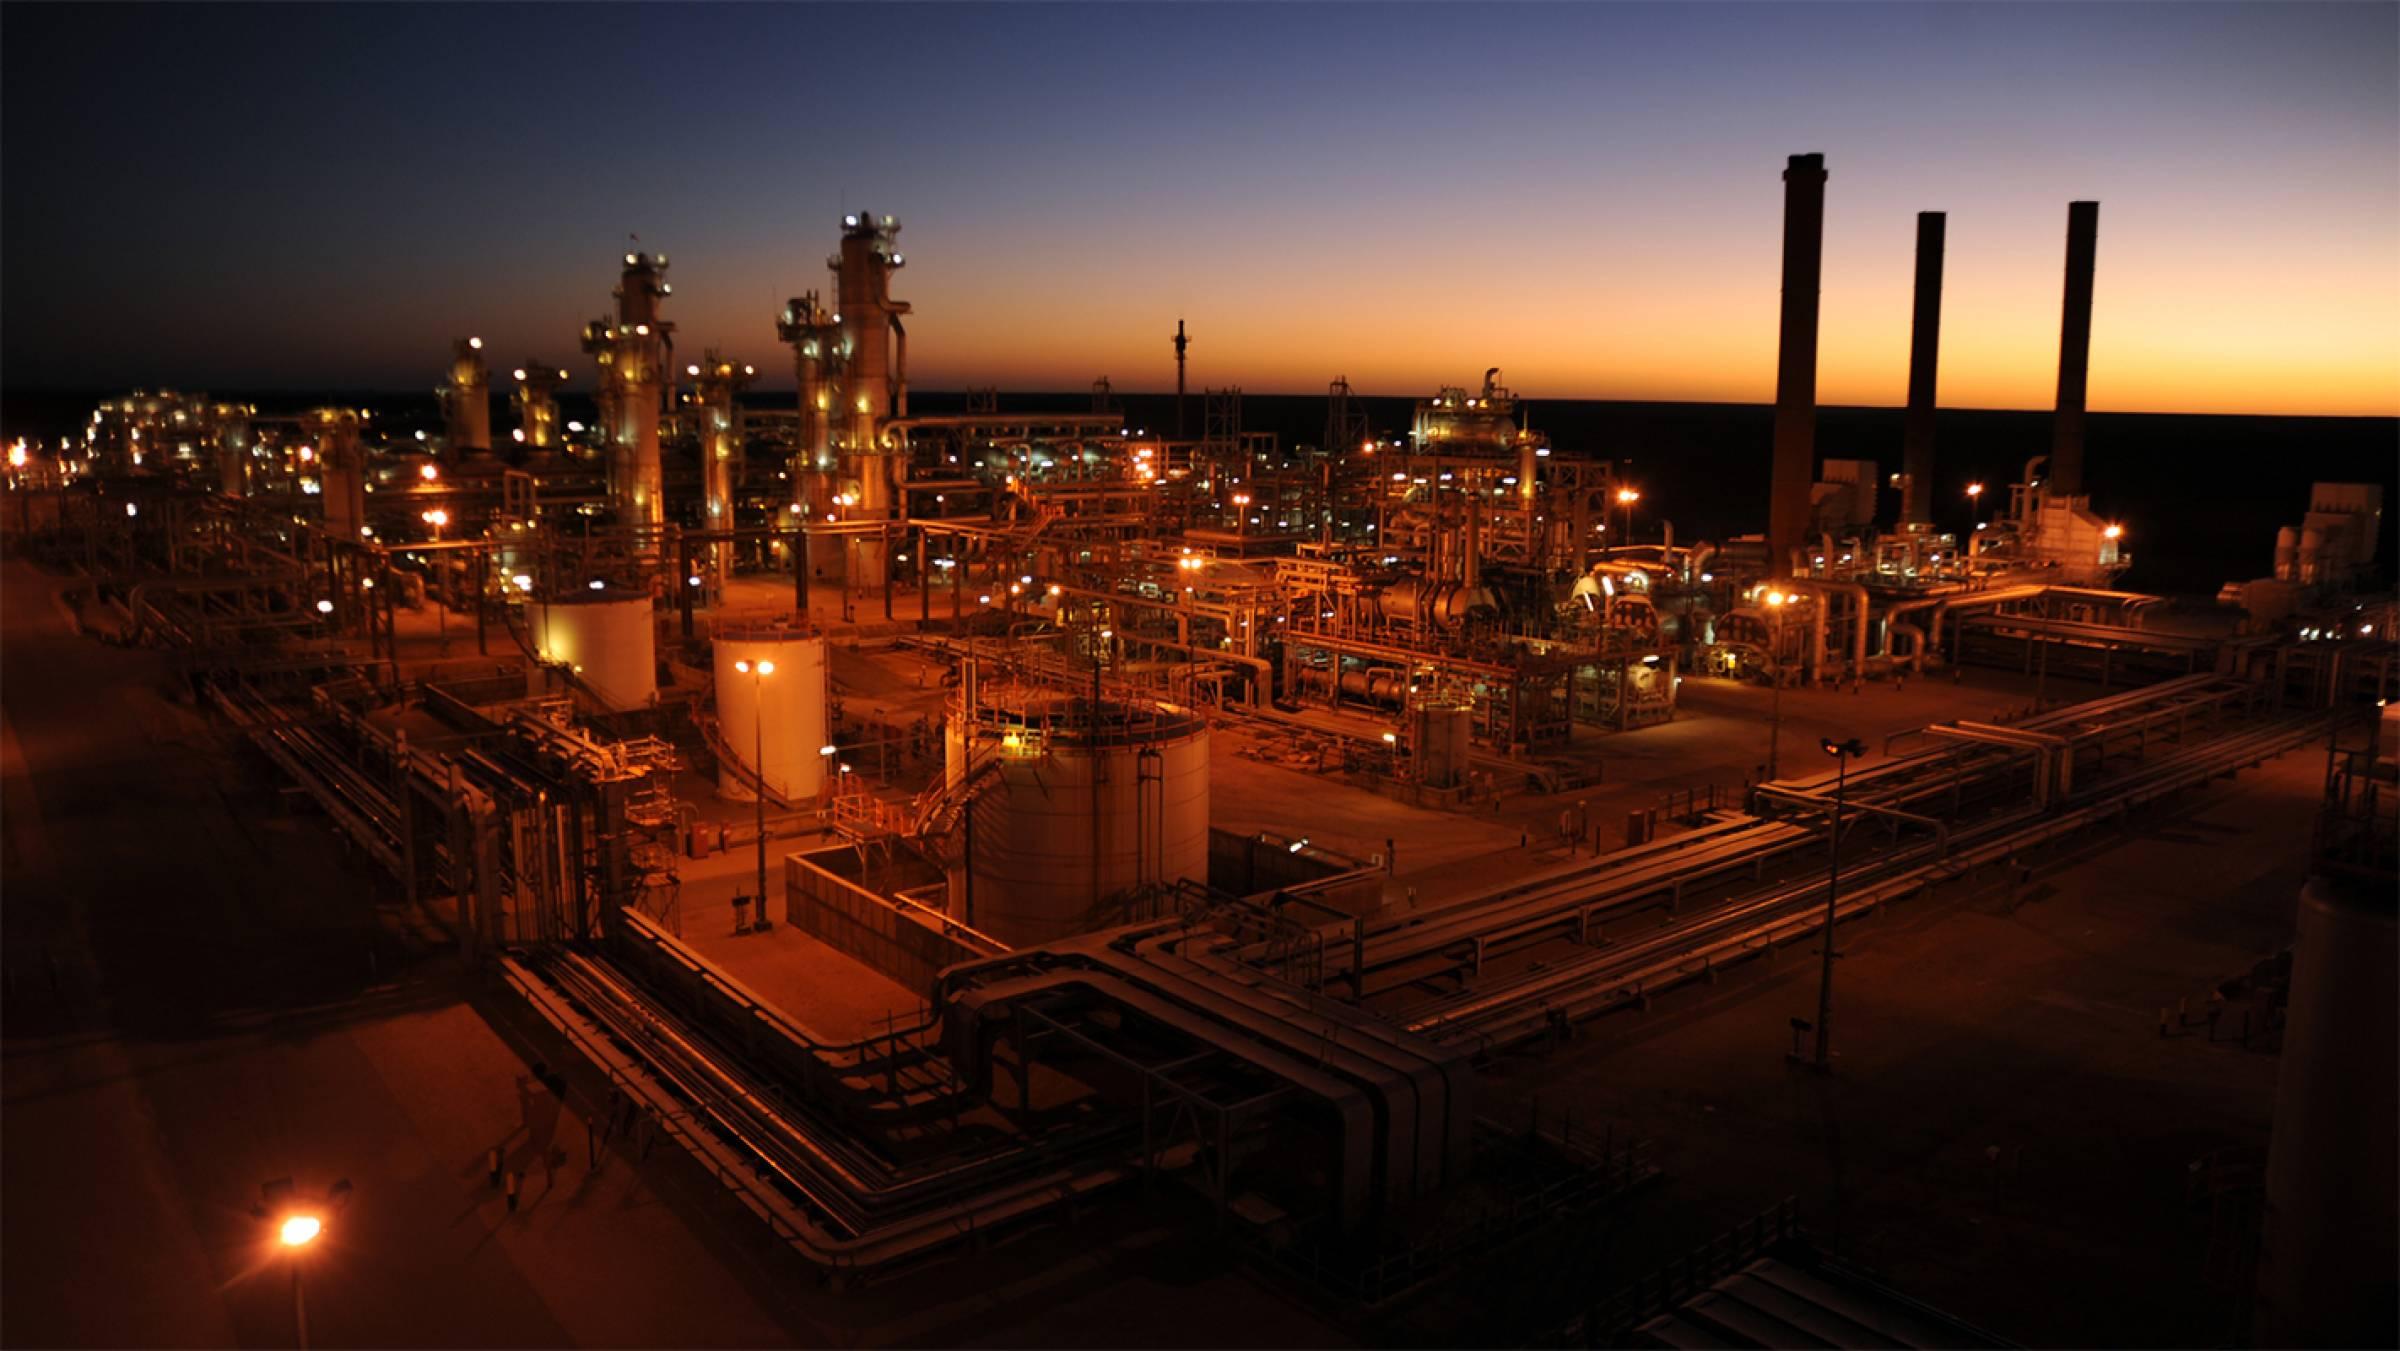 Meghachem Industries